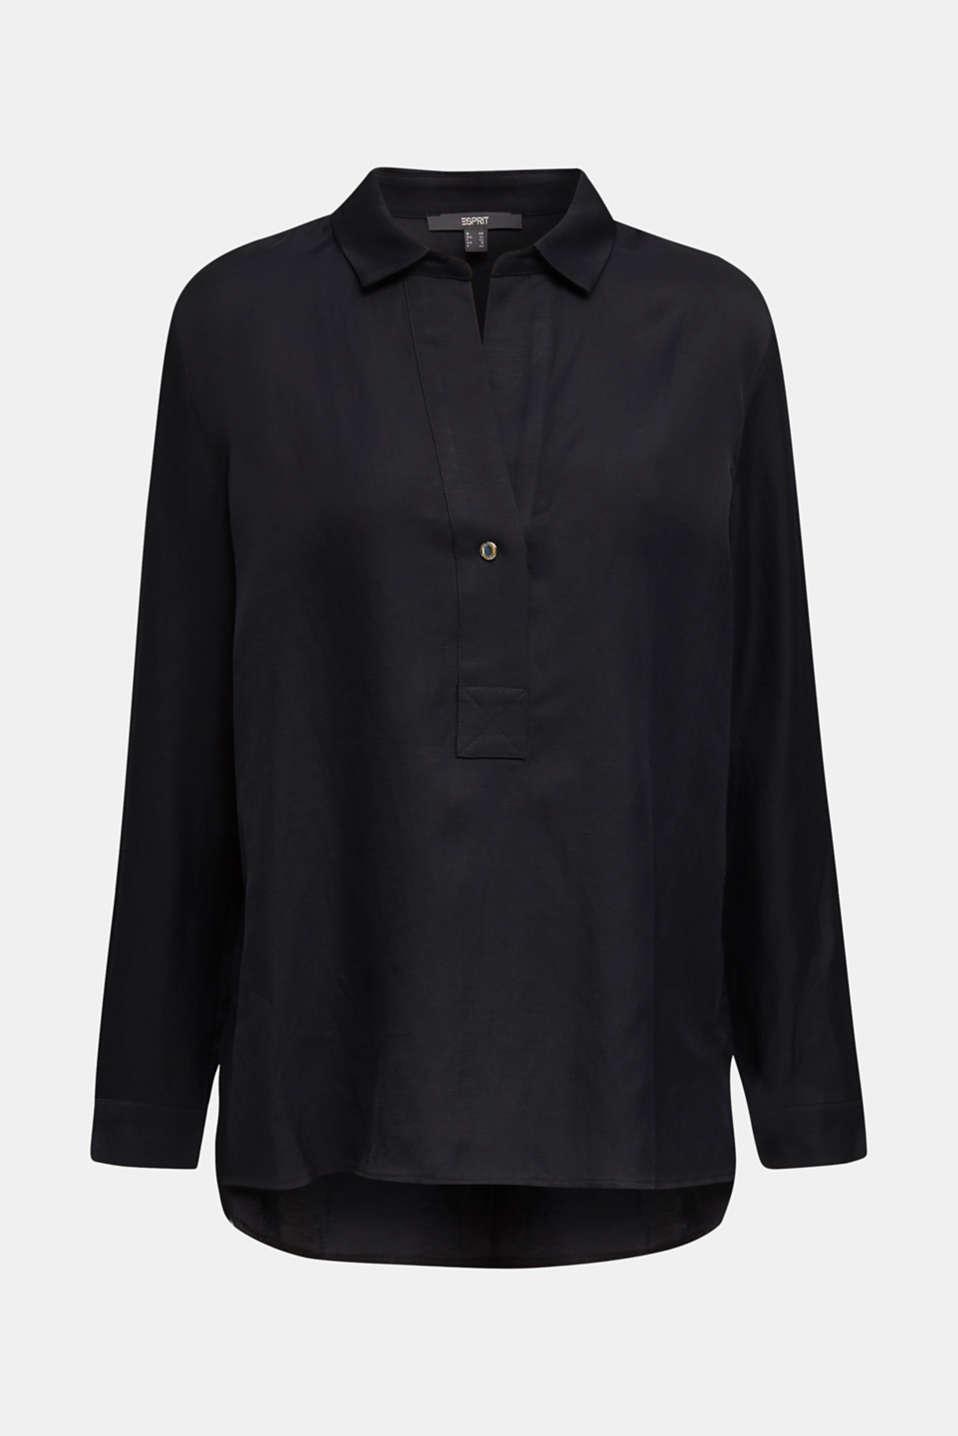 Blended linen: Slip-on blouse with button, BLACK, detail image number 8